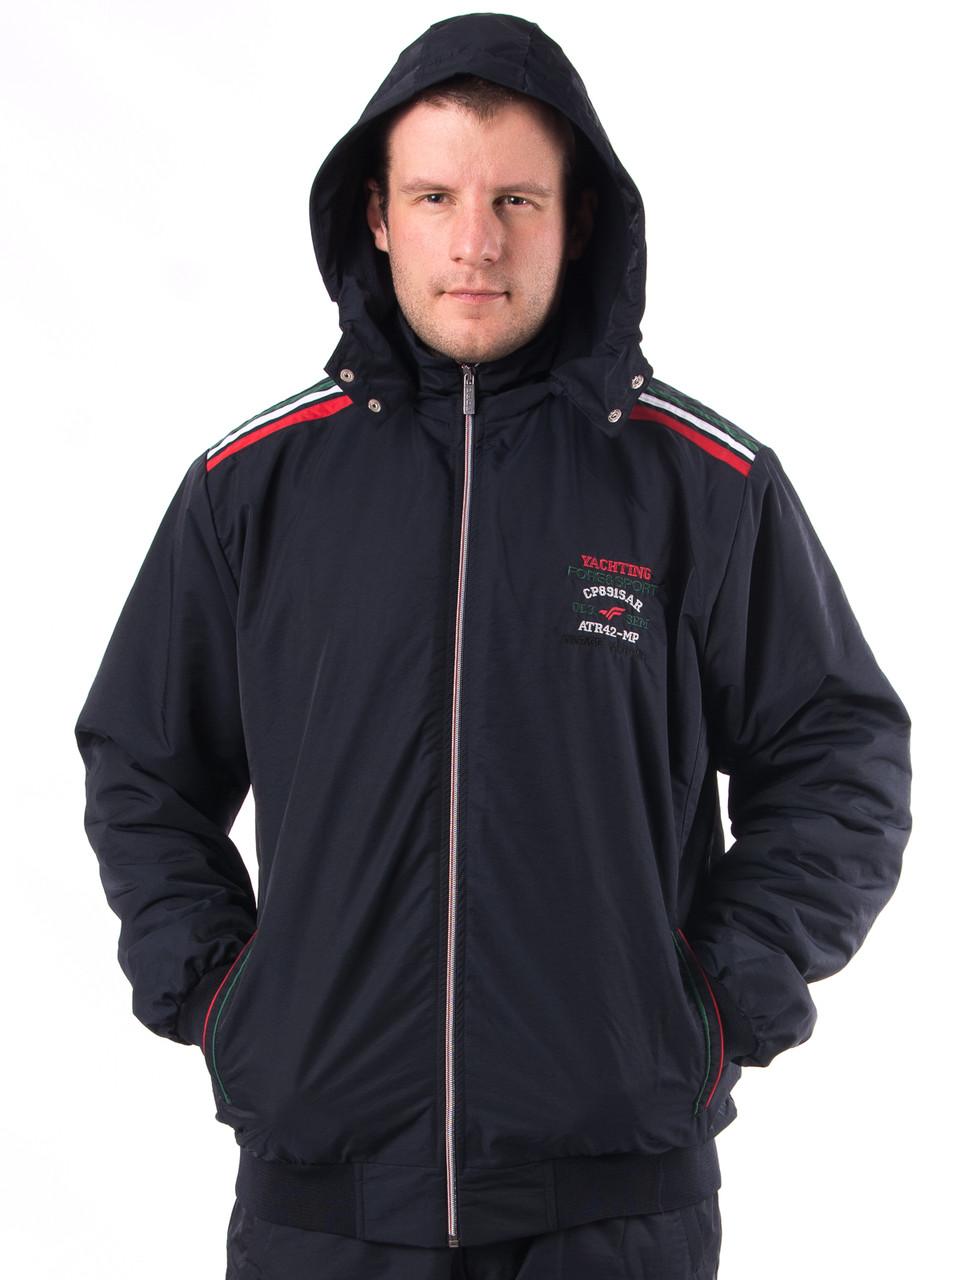 Мужской теплый спортивный костюм плащевка на флисе т.м. Fore 1146, фото 2  ... a3c41b9e74e